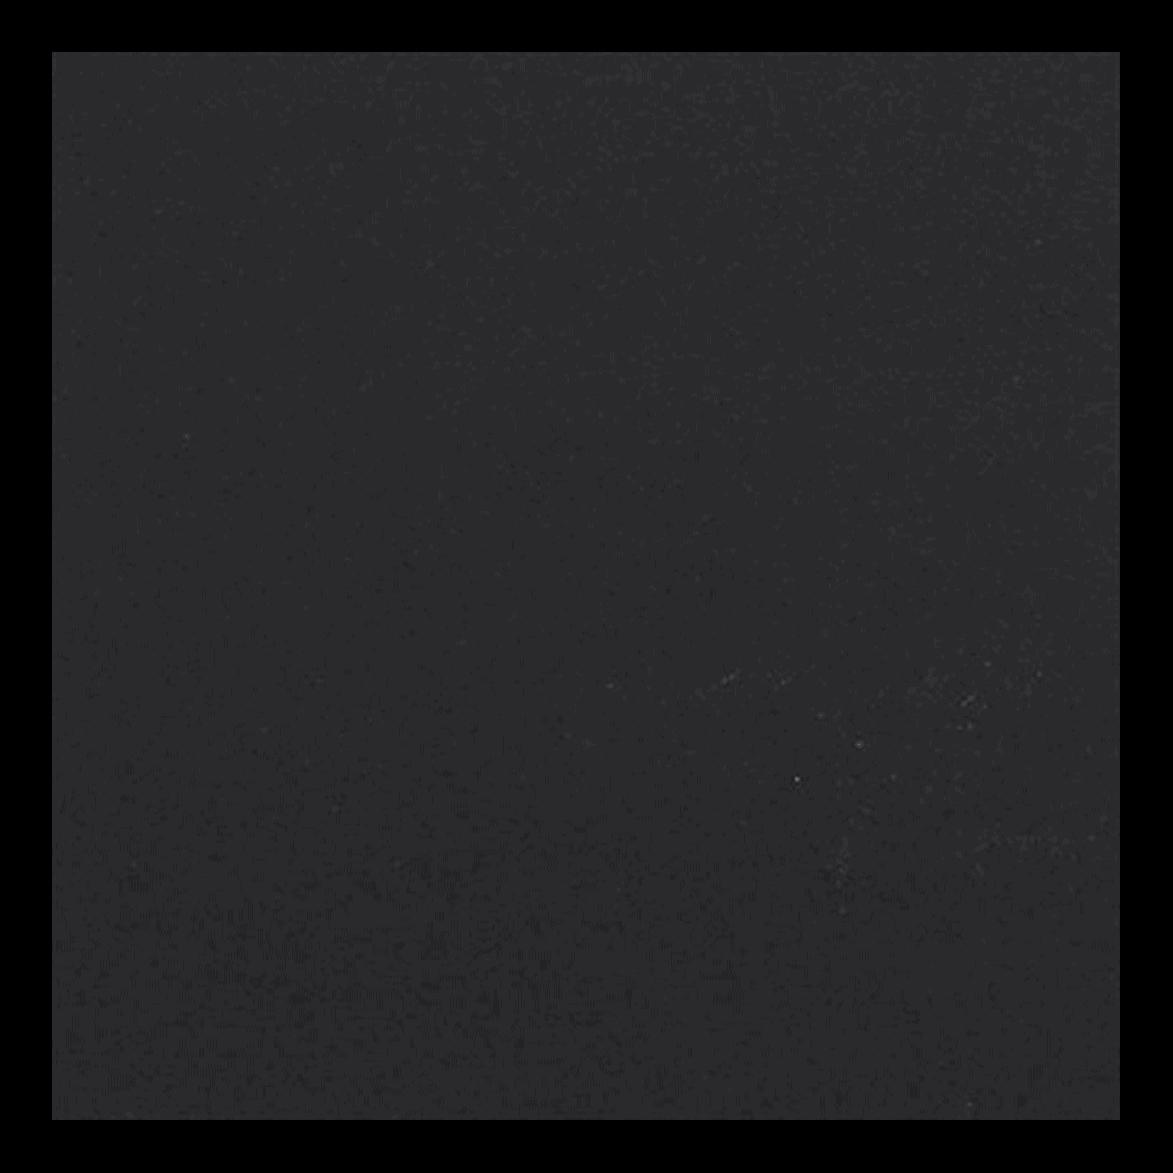 Endura_PITCH_BLACK2